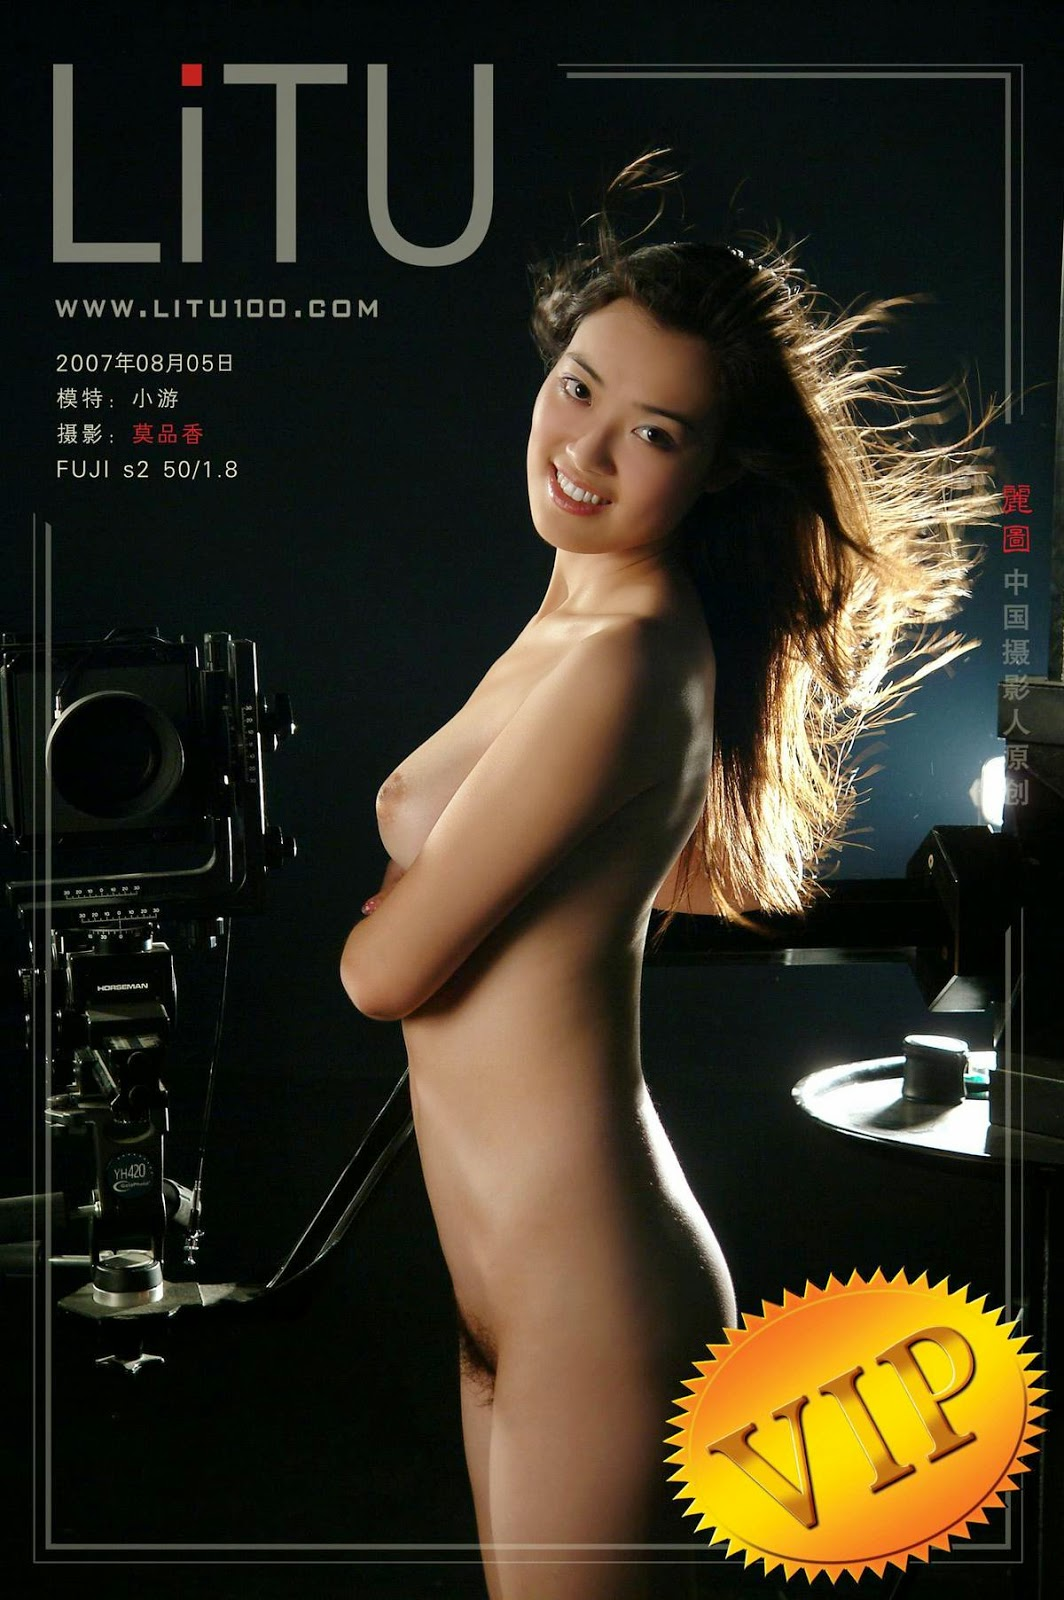 Chinese Nude Model Siao You  [Litu100]  | 18+ gallery photos